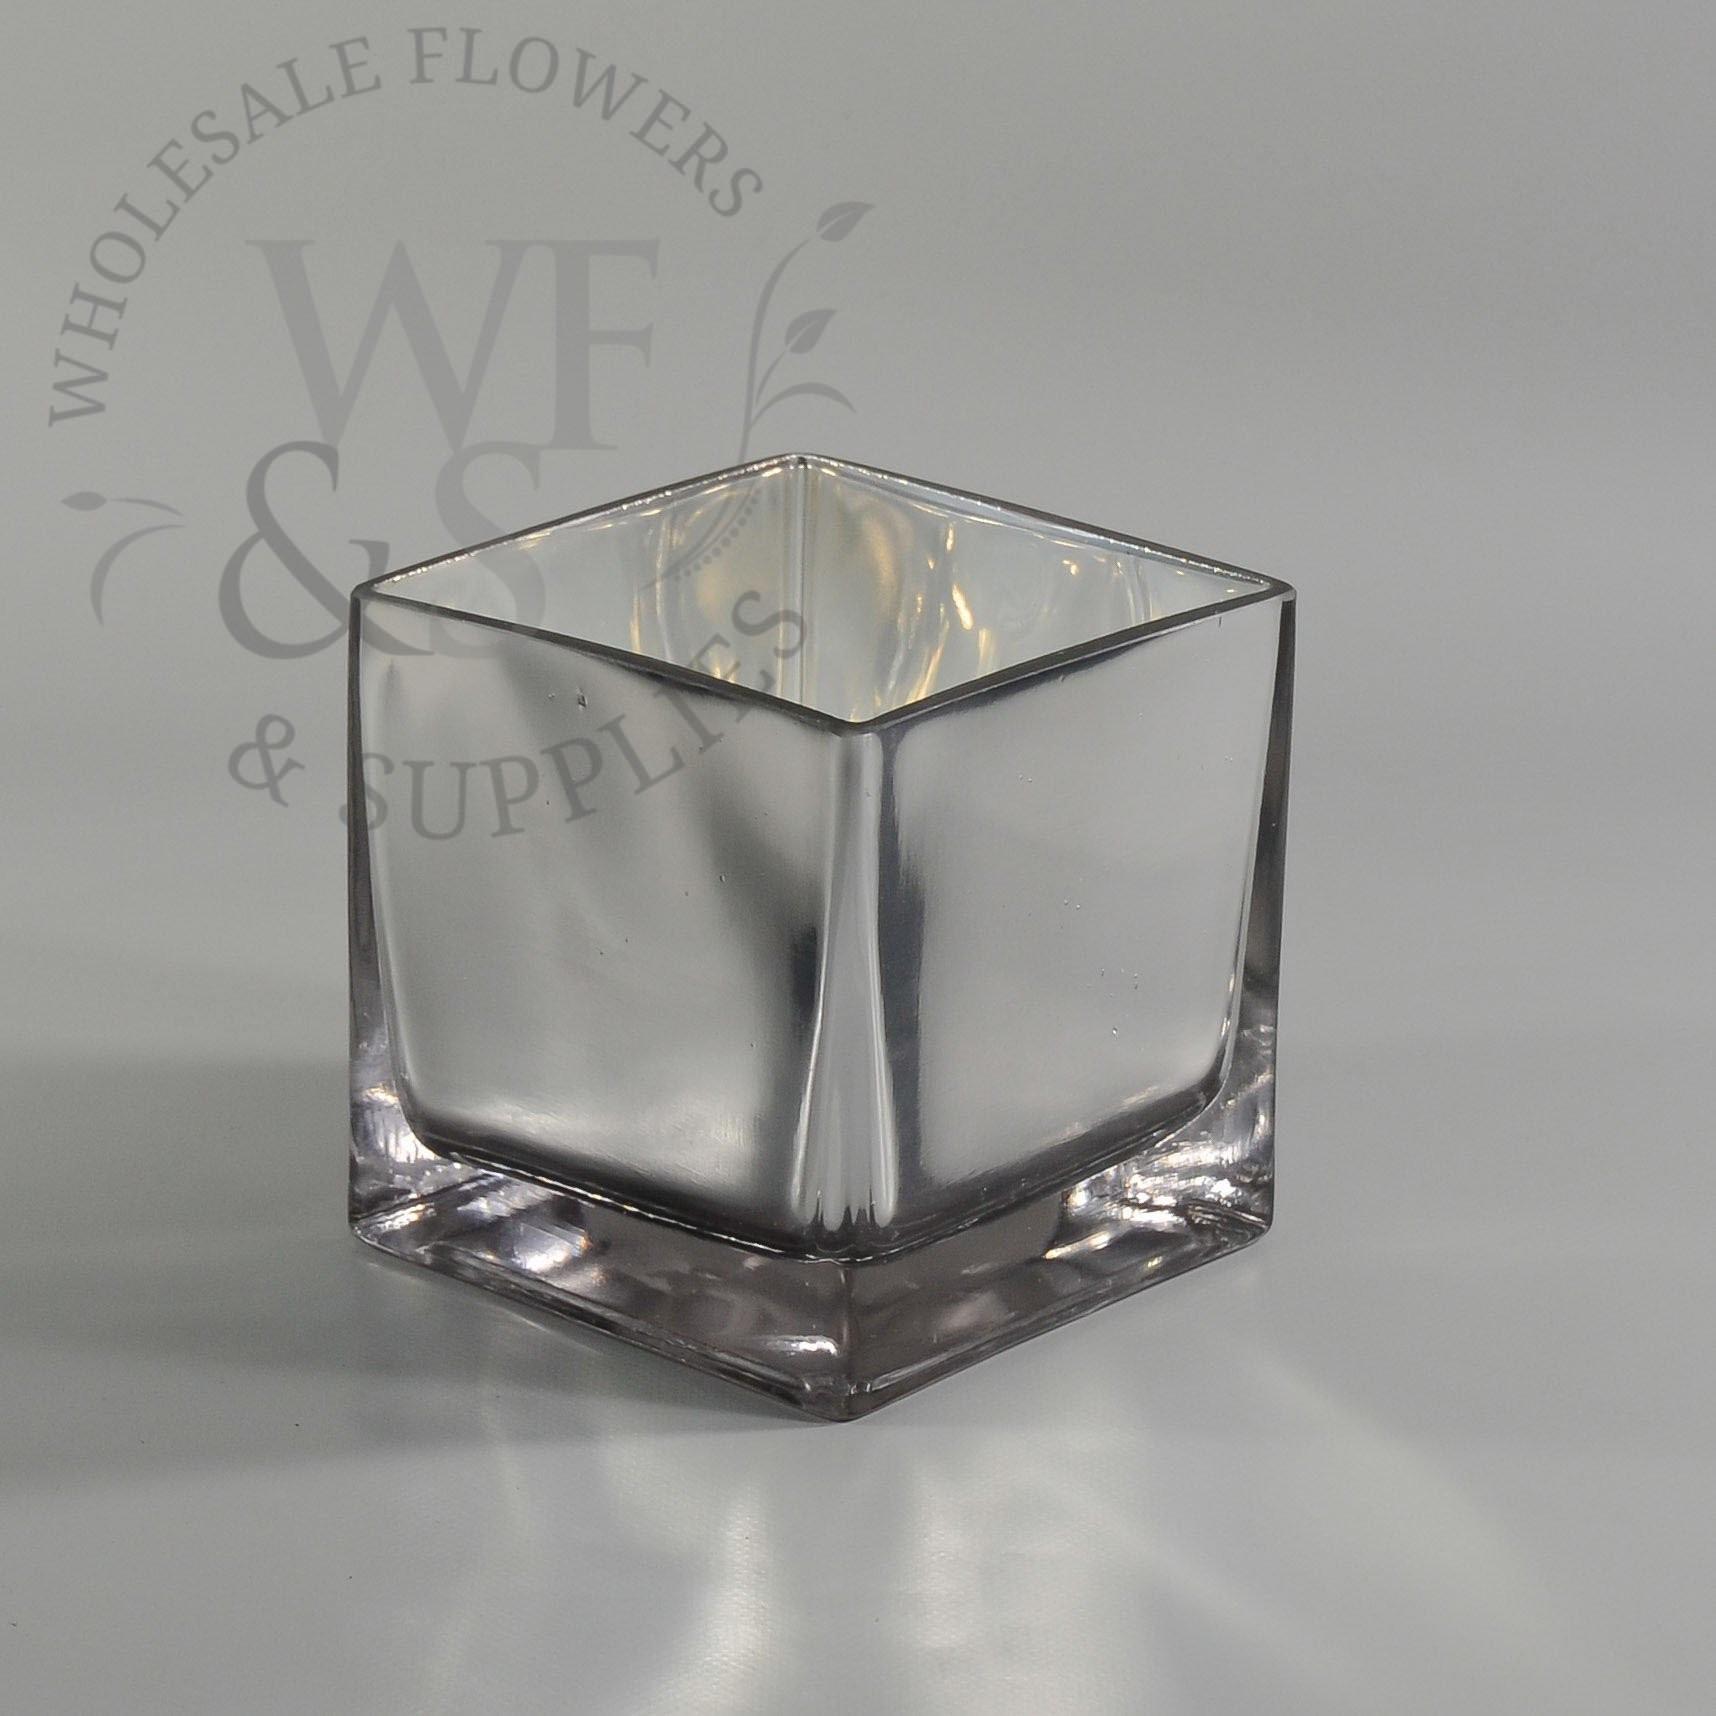 antique black glass vase of 13 fresh silver mirror vase bogekompresorturkiye com for crystal mirror inspirational mirror vase 8 1h vases mirrored square cube riser inch squarei 0d uk